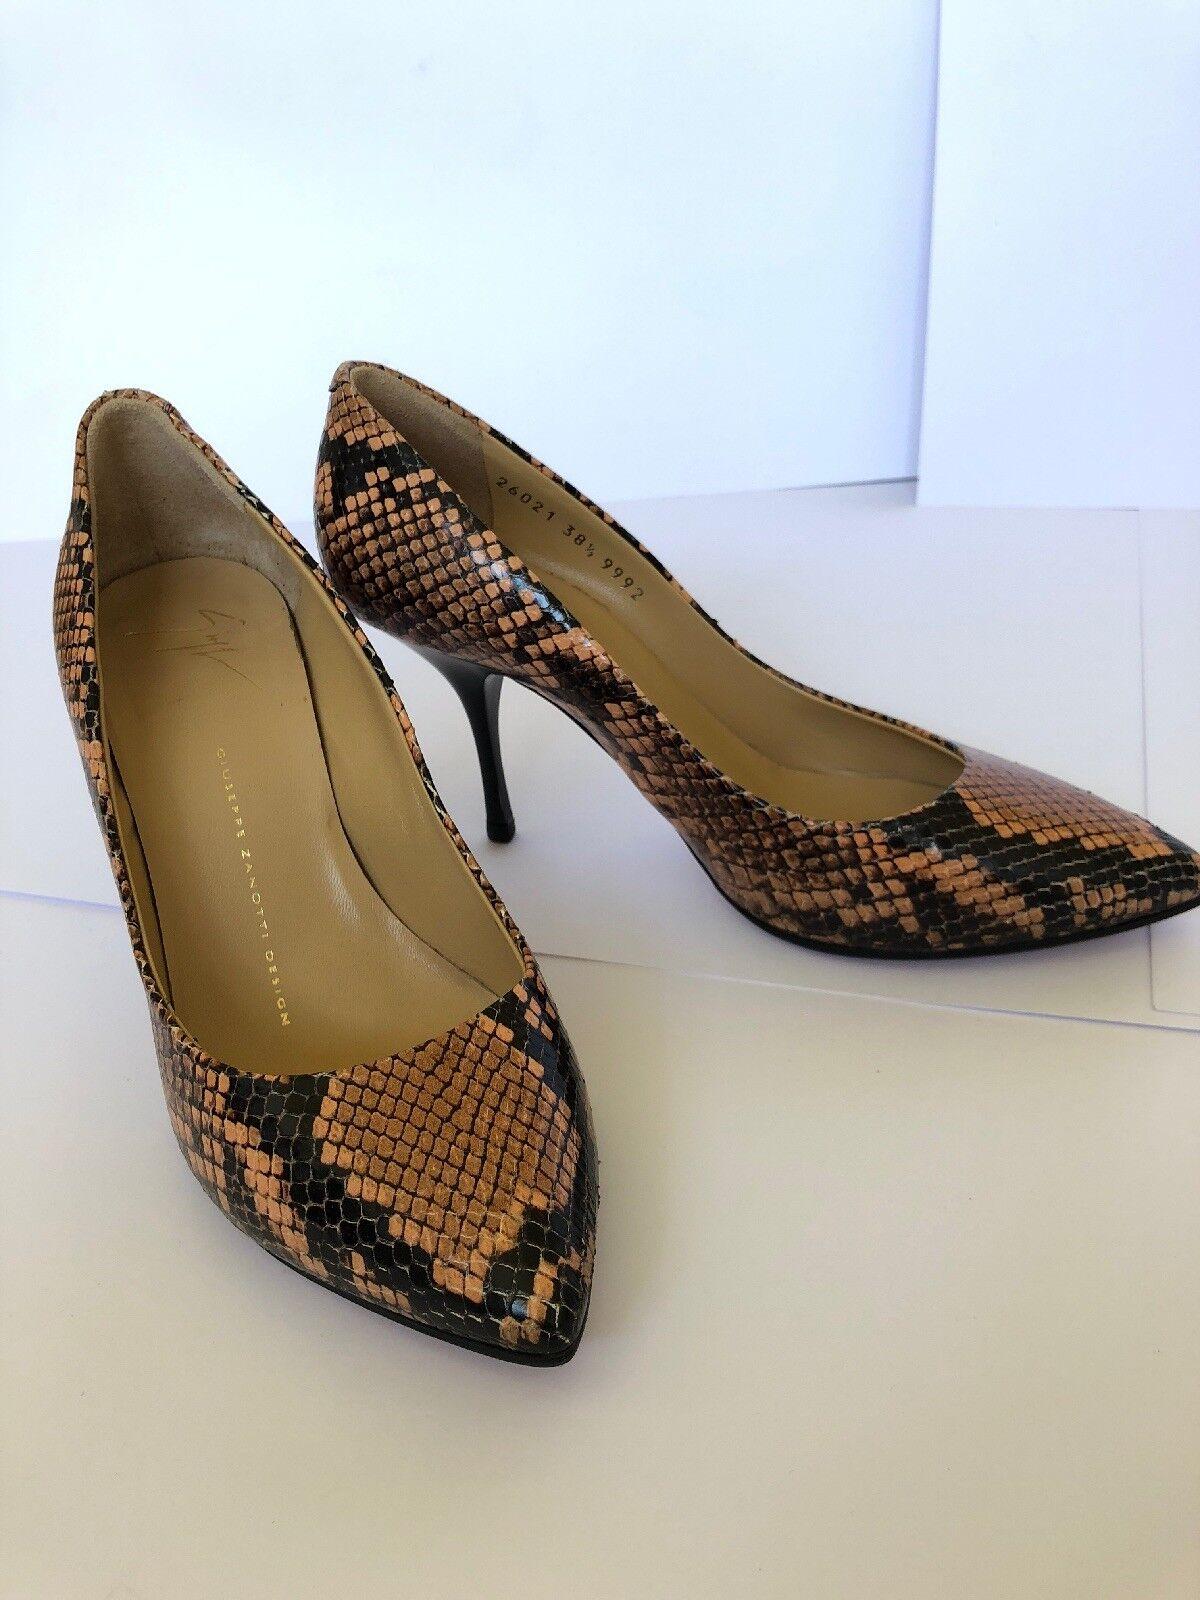 Giuseppe zanotti snake skin pumps shoes heels 38.5 New